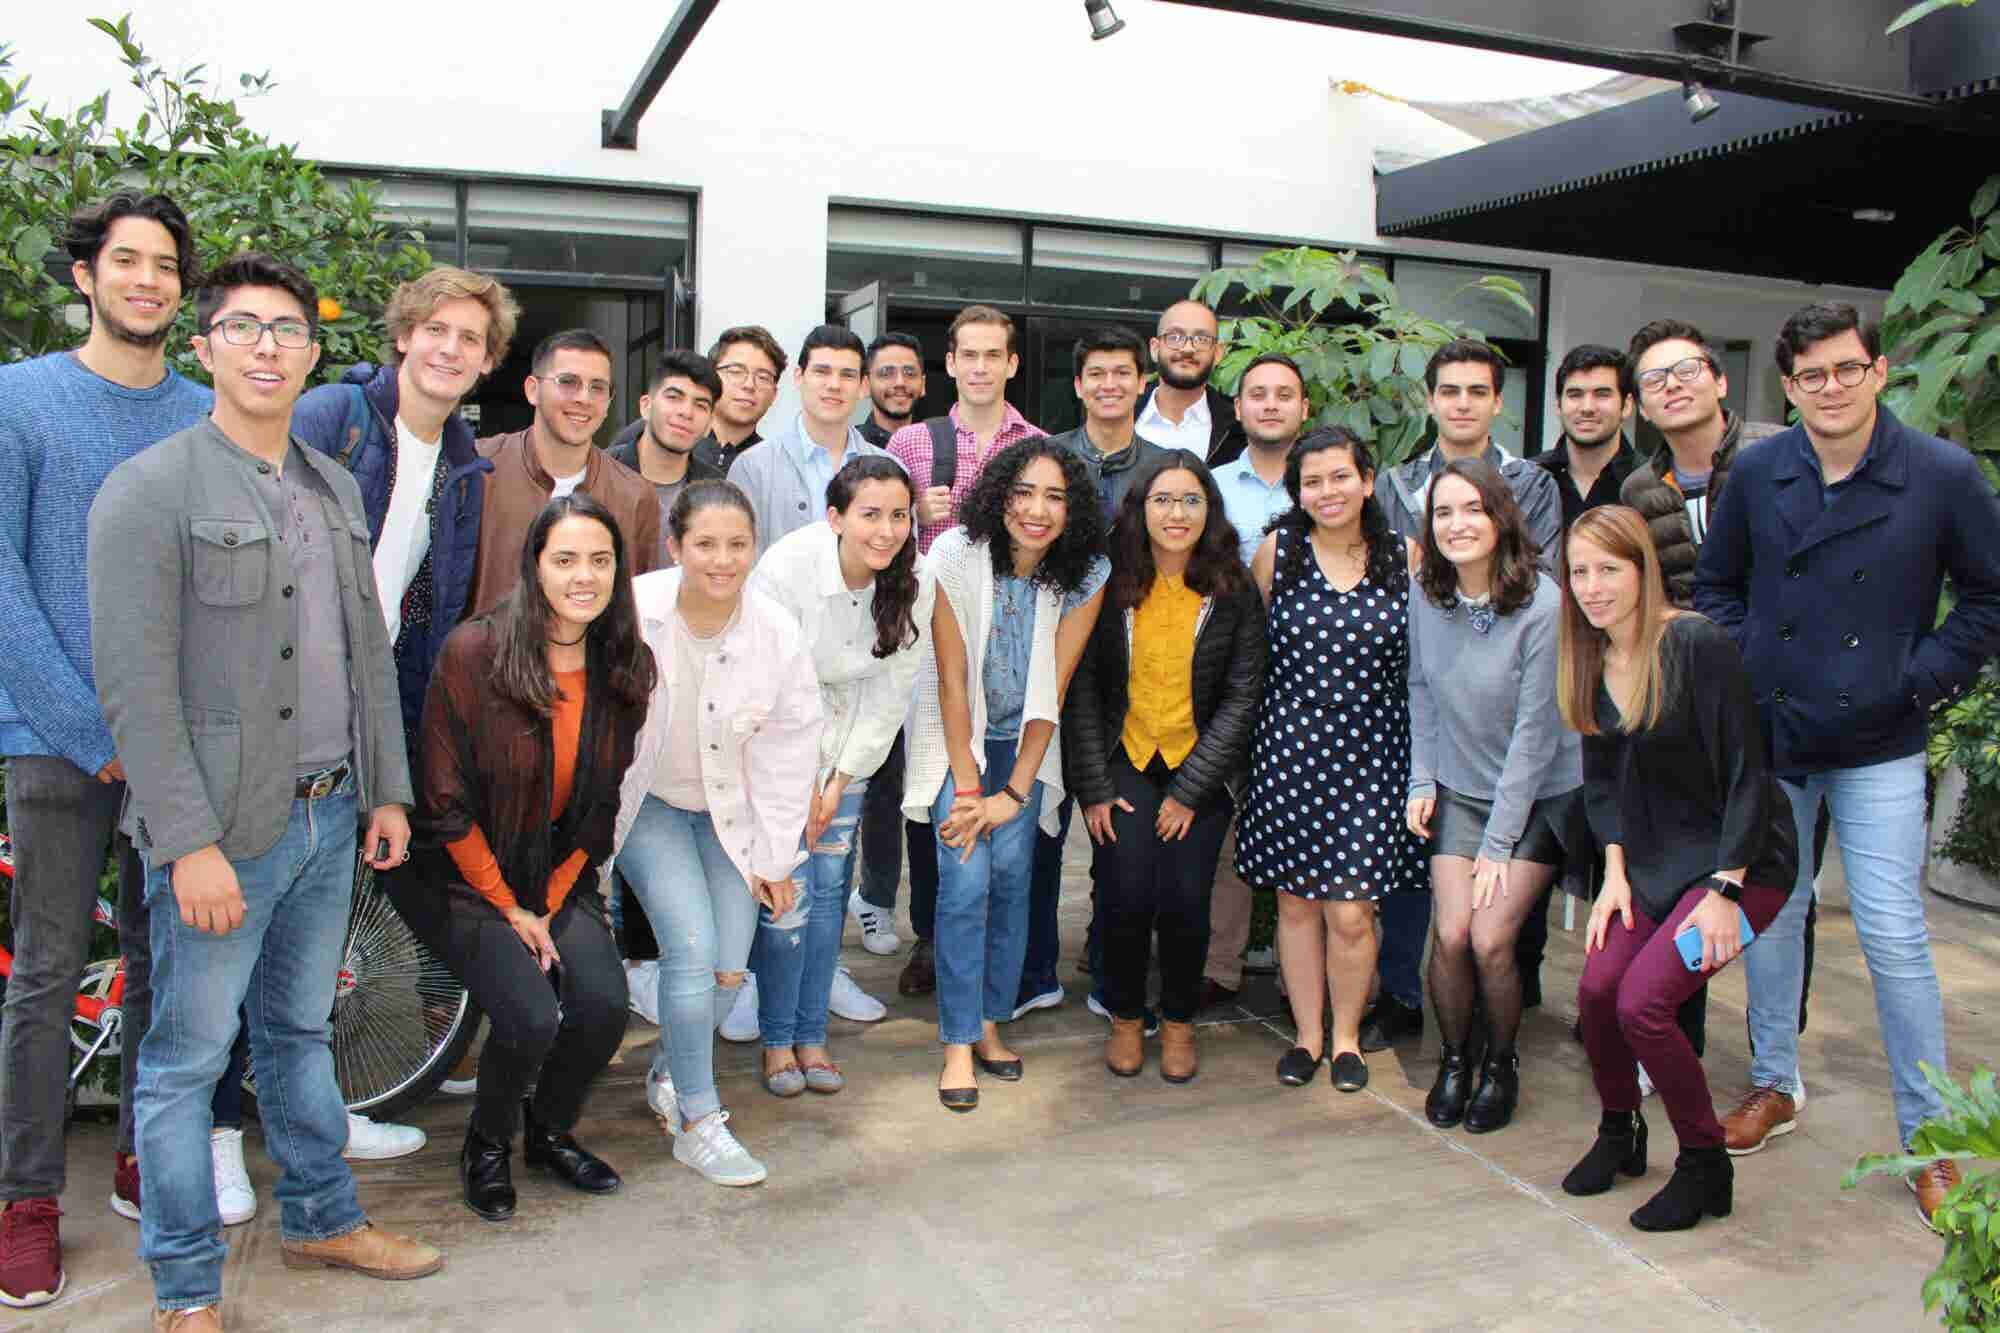 AT&T impulsa a jóvenes emprendedores con vena social